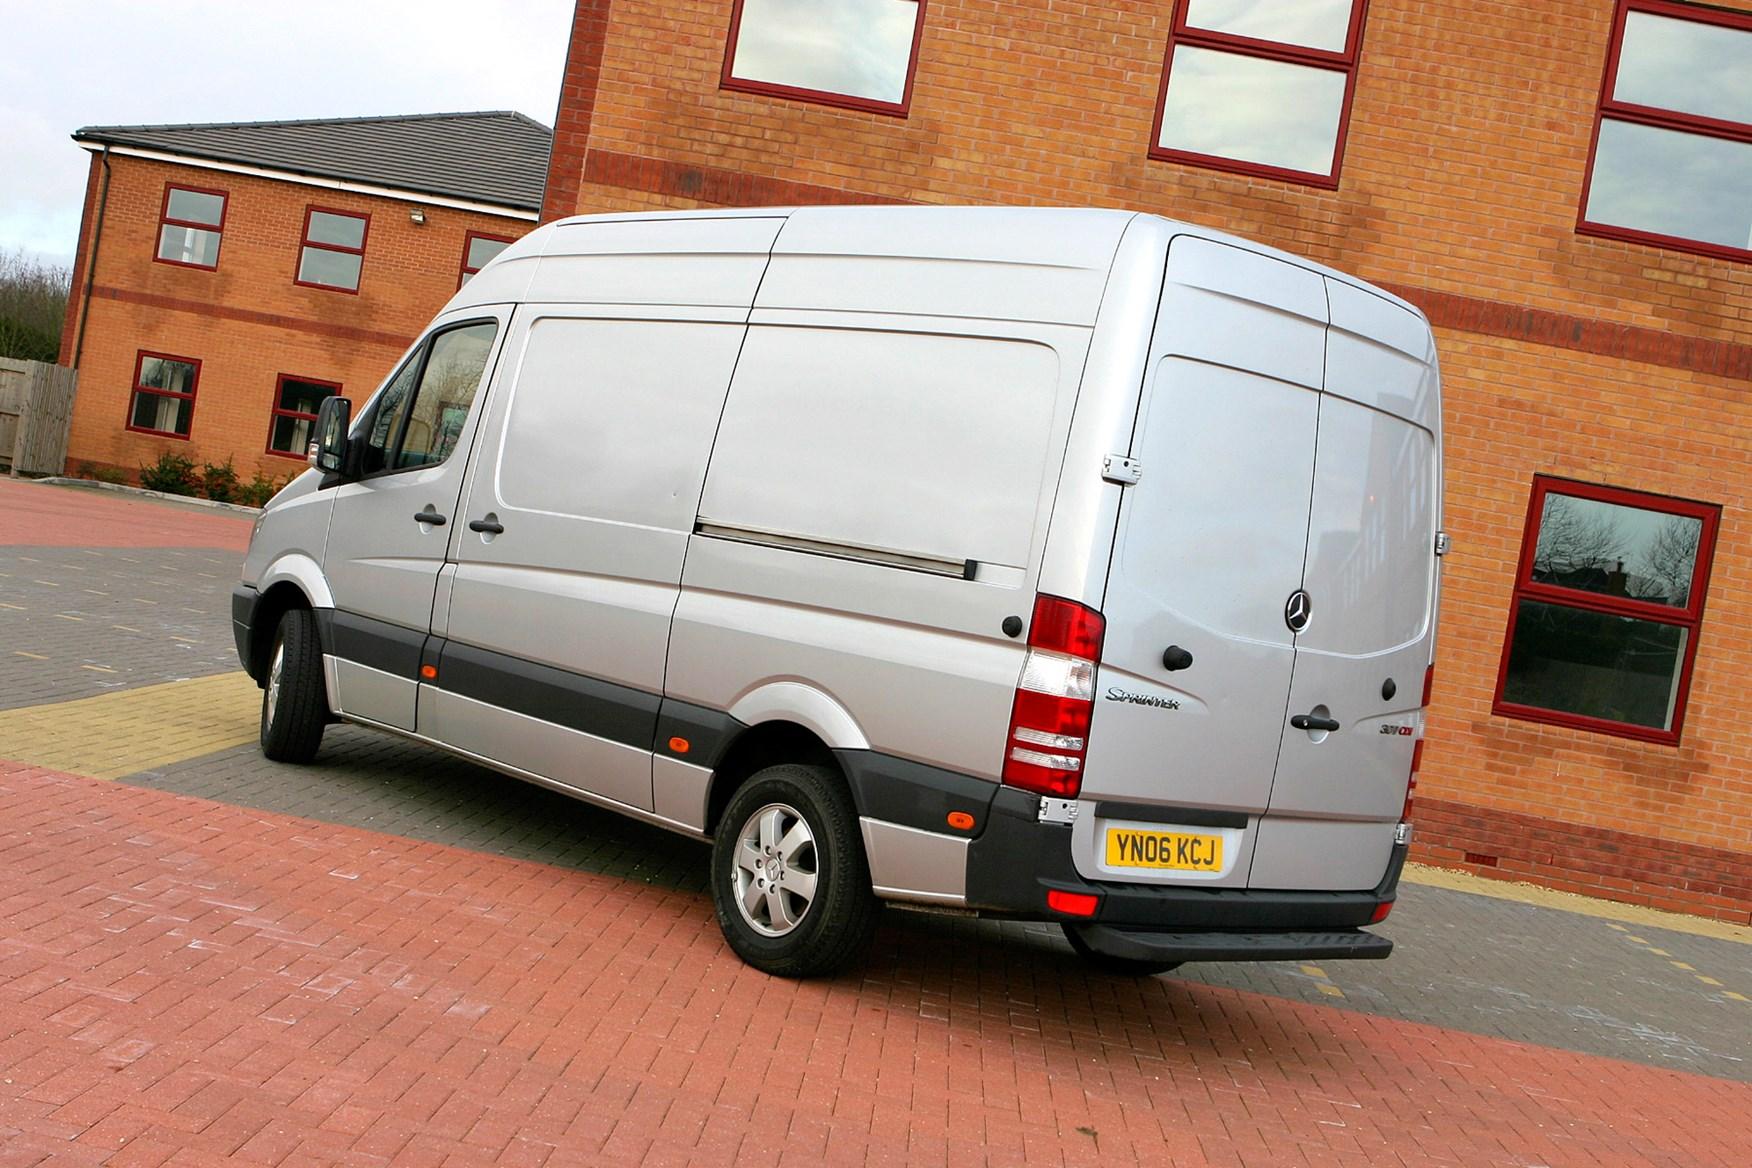 Mercedes-Benz Sprinter 2006-2013 review on Parkers Vans - rear exterior